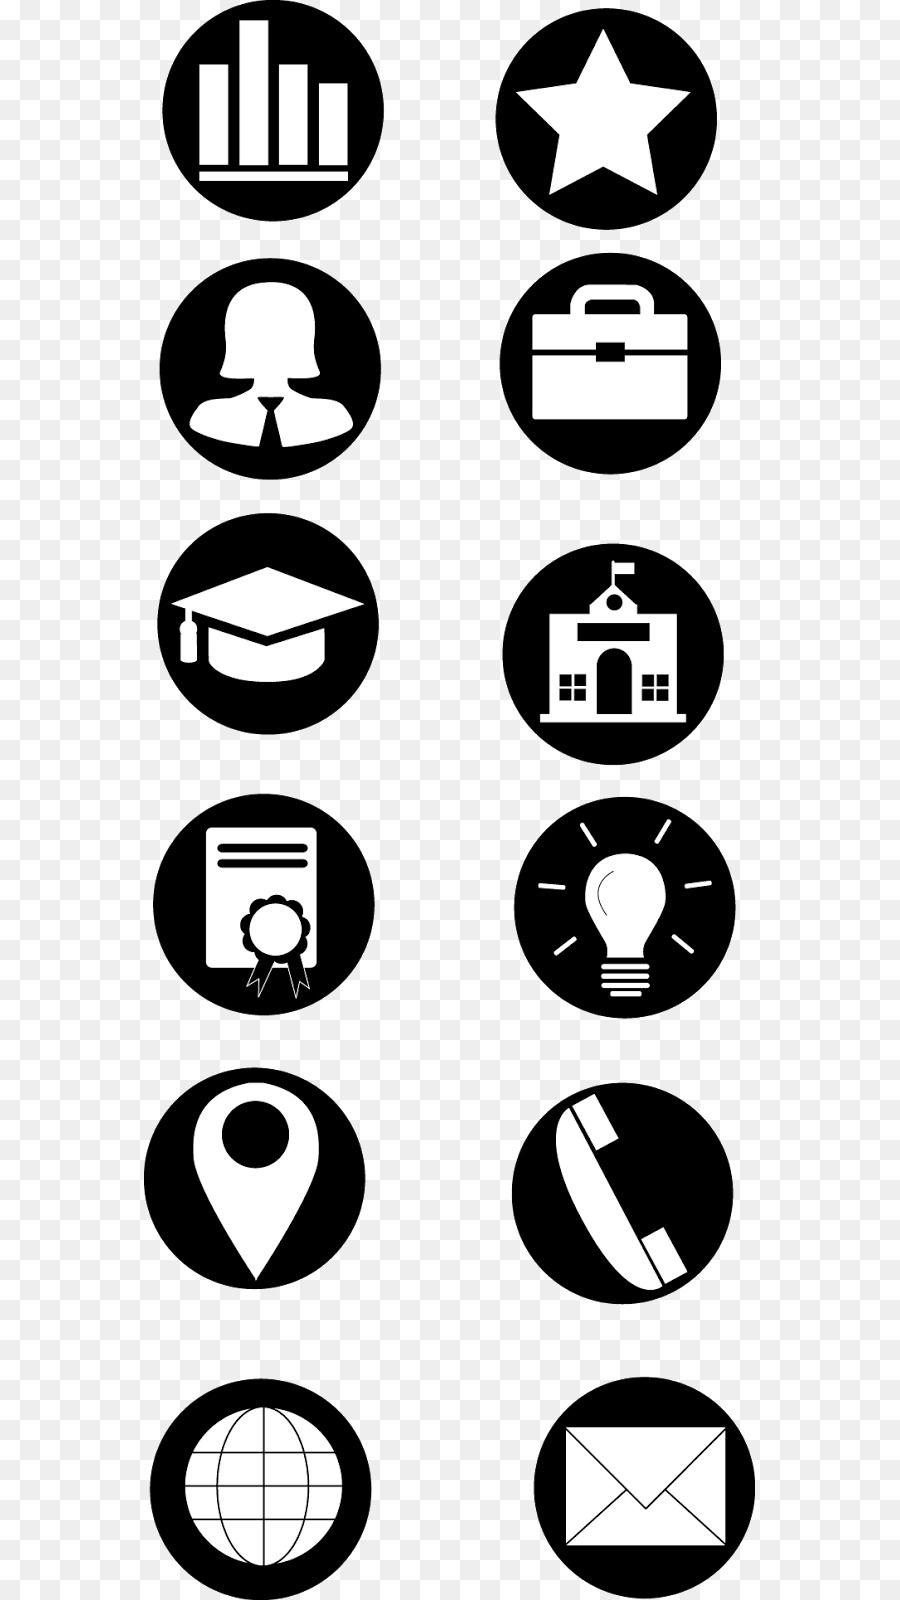 Ikon Komputer Kurikulum Simbol Gambar Png Ikon Komputer Cv Kreatif Simbol